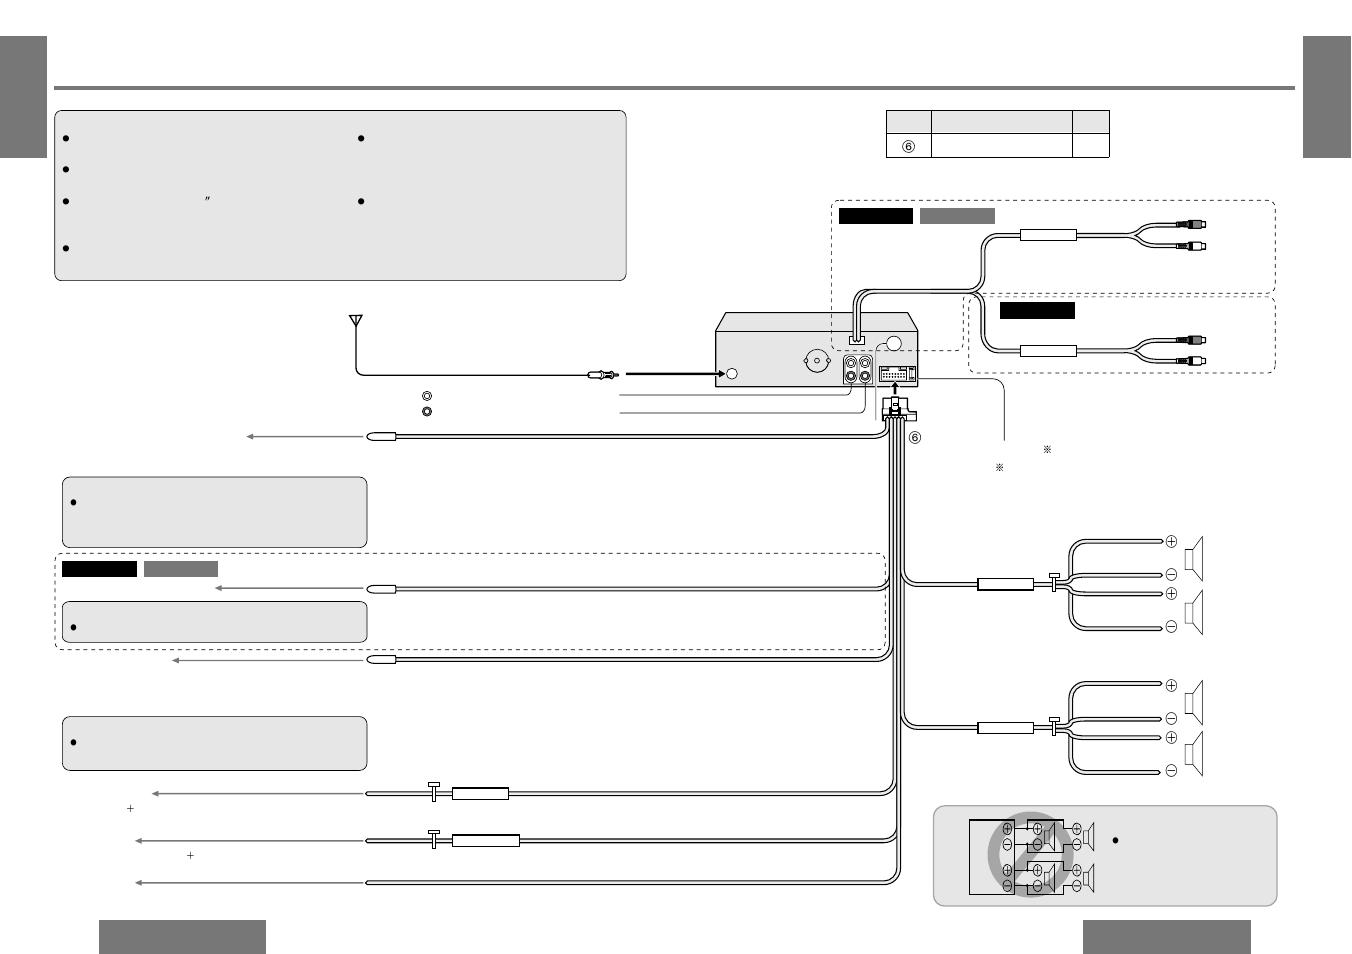 panasonic cq rx100u wiring diagram best wiring diagram image 2018 panasonic radio wiring diagram glamorous panasonic cq c1333u wiring diagram images best image